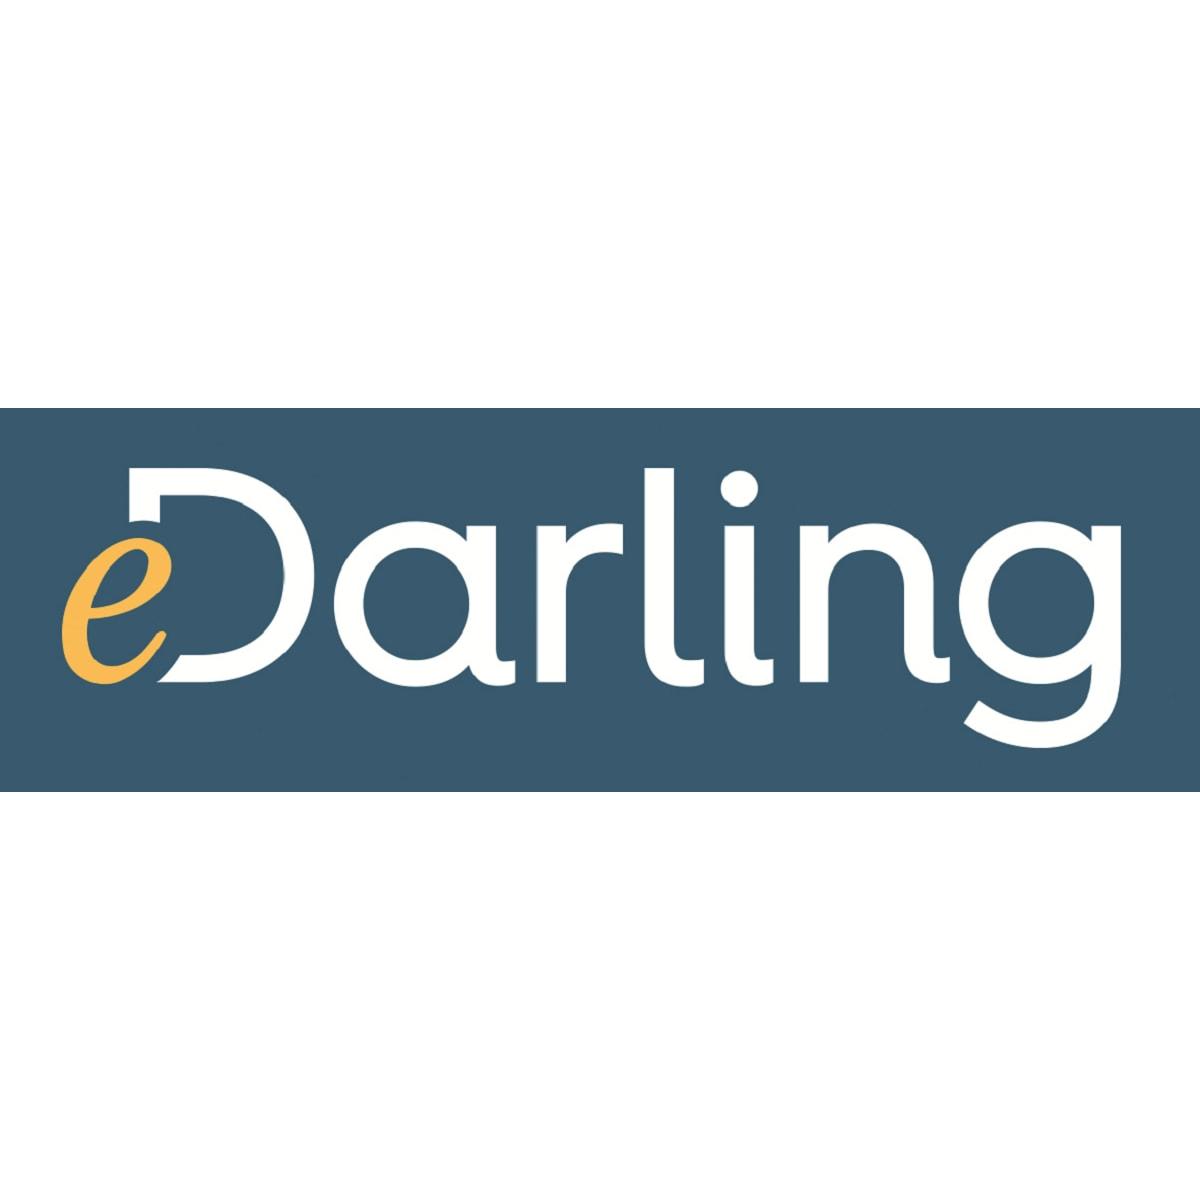 edarling randki portal randkowy